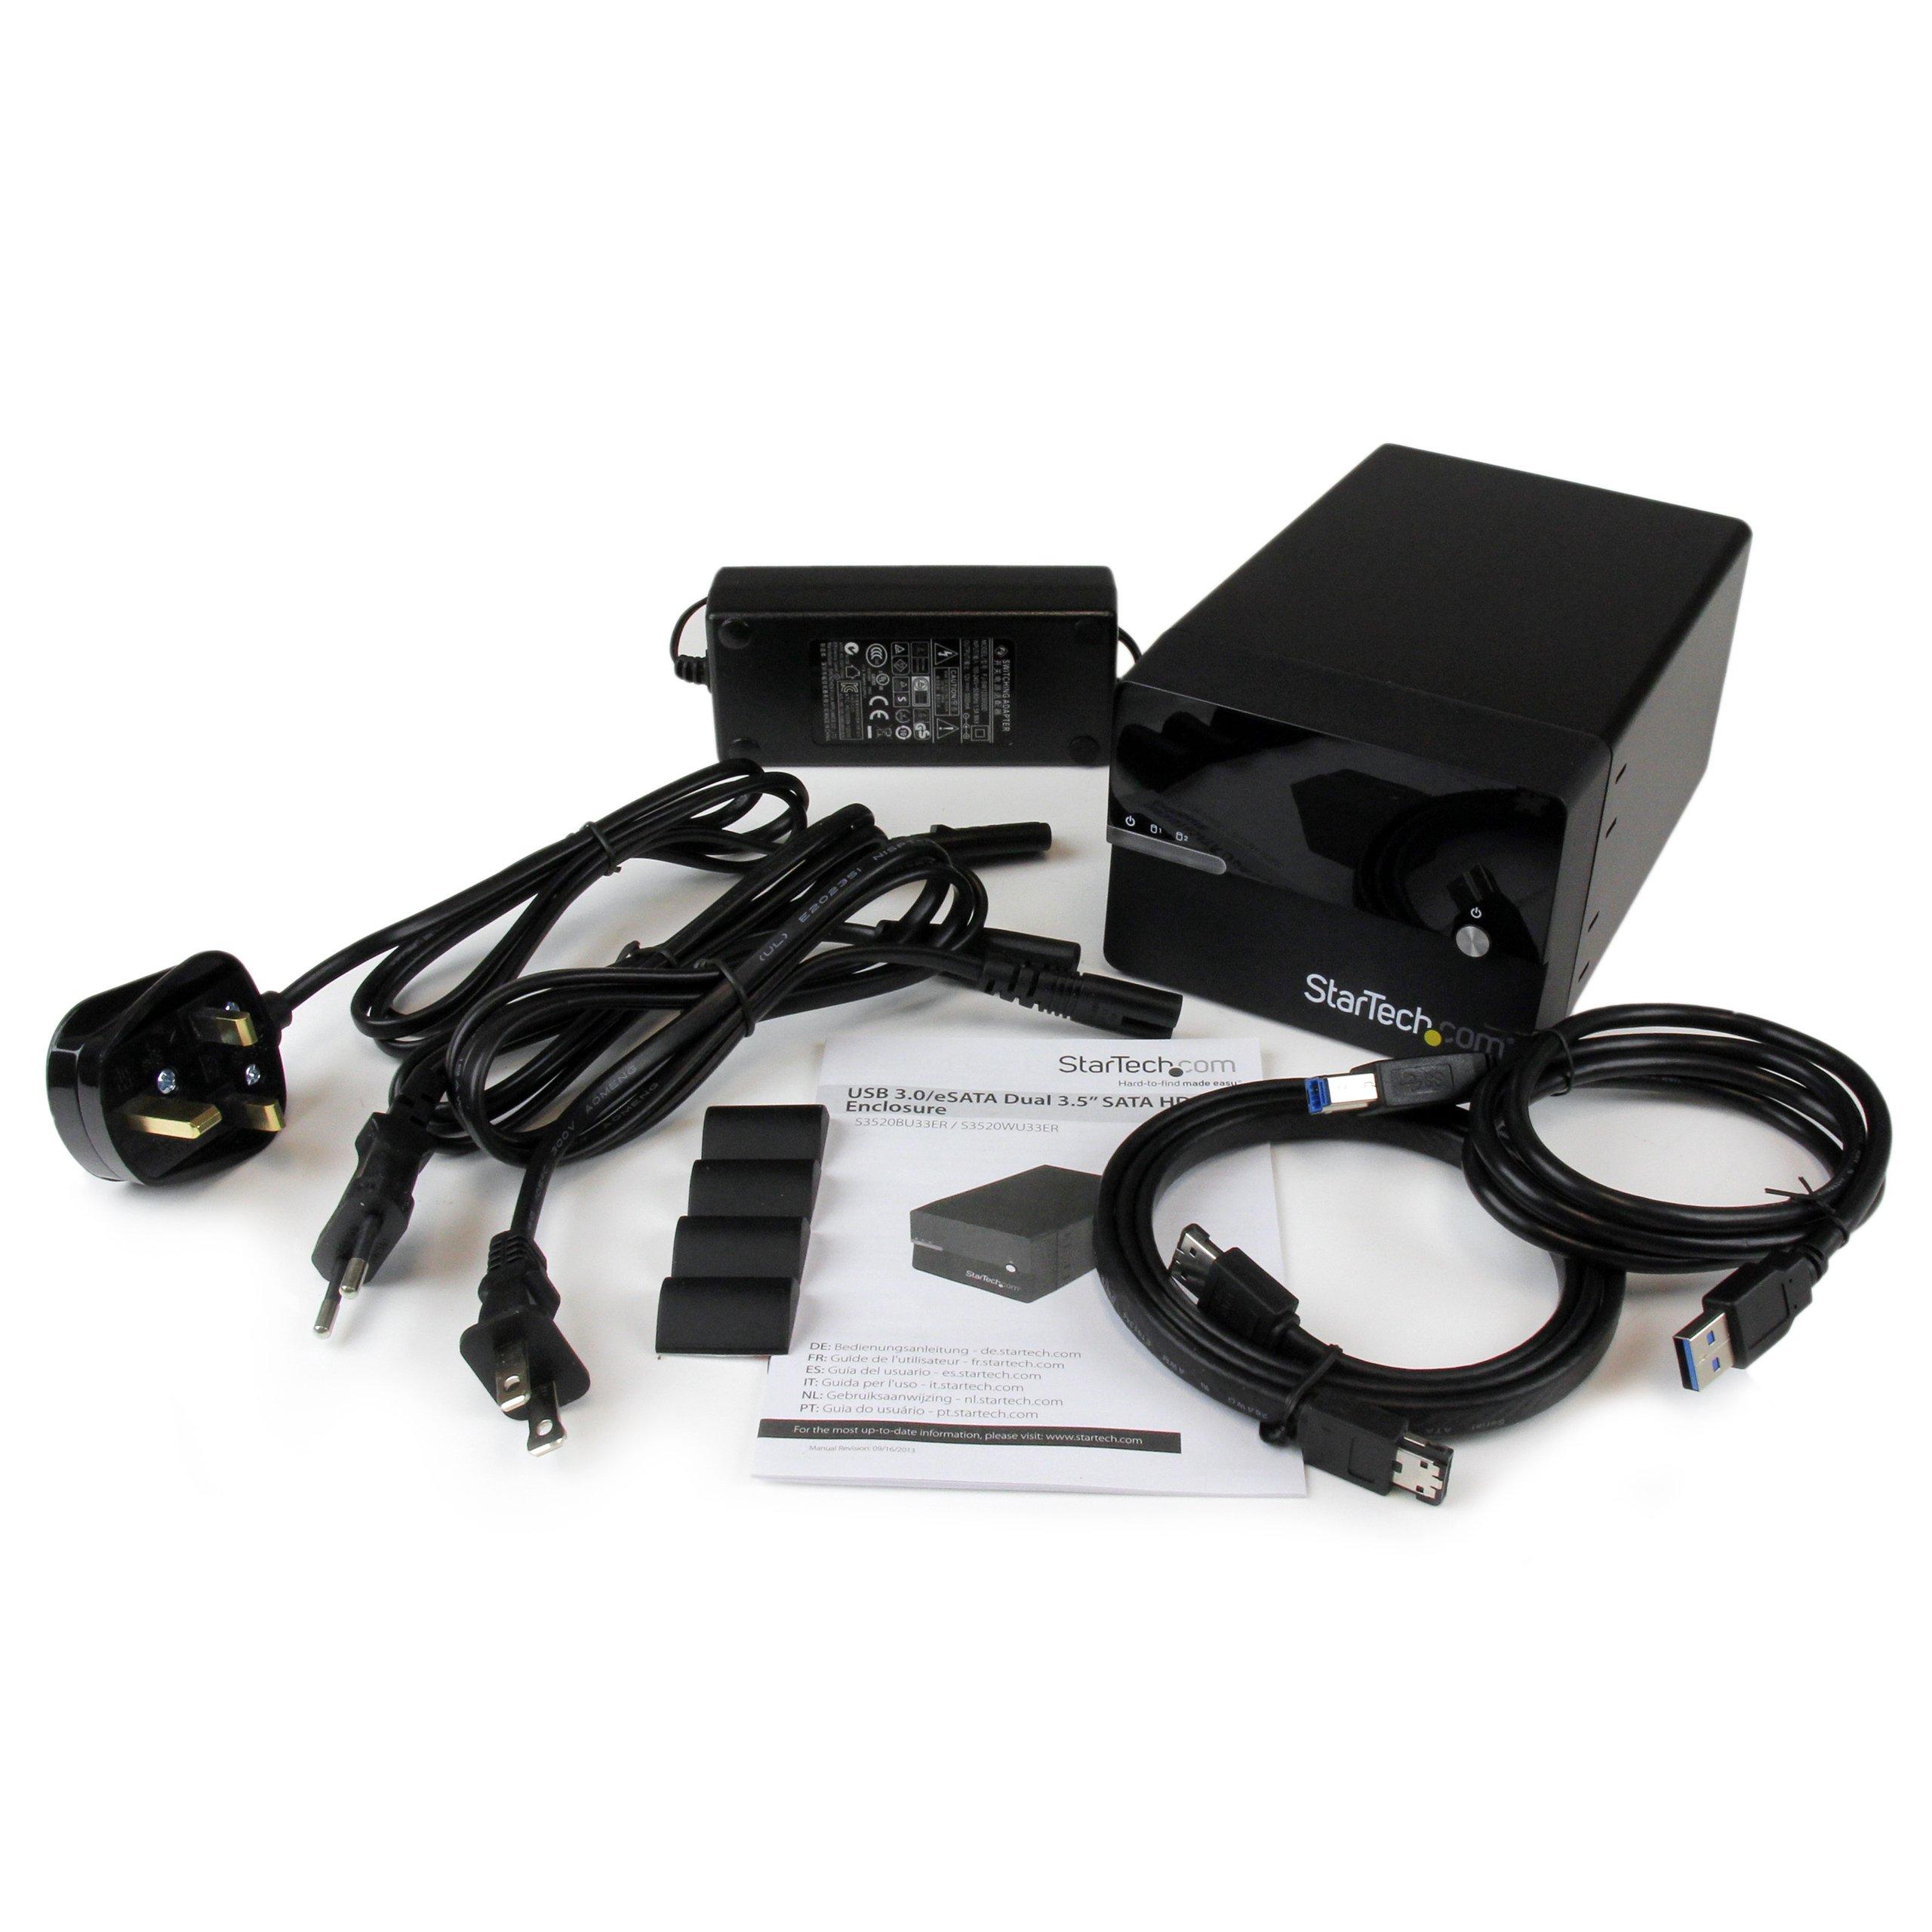 StarTech.com USB 3.0 eSATA Dual 3.5-Inch SATA III Hard Drive RAID Enclosure with UASP and Fan - Black (S3520BU33ER) by StarTech